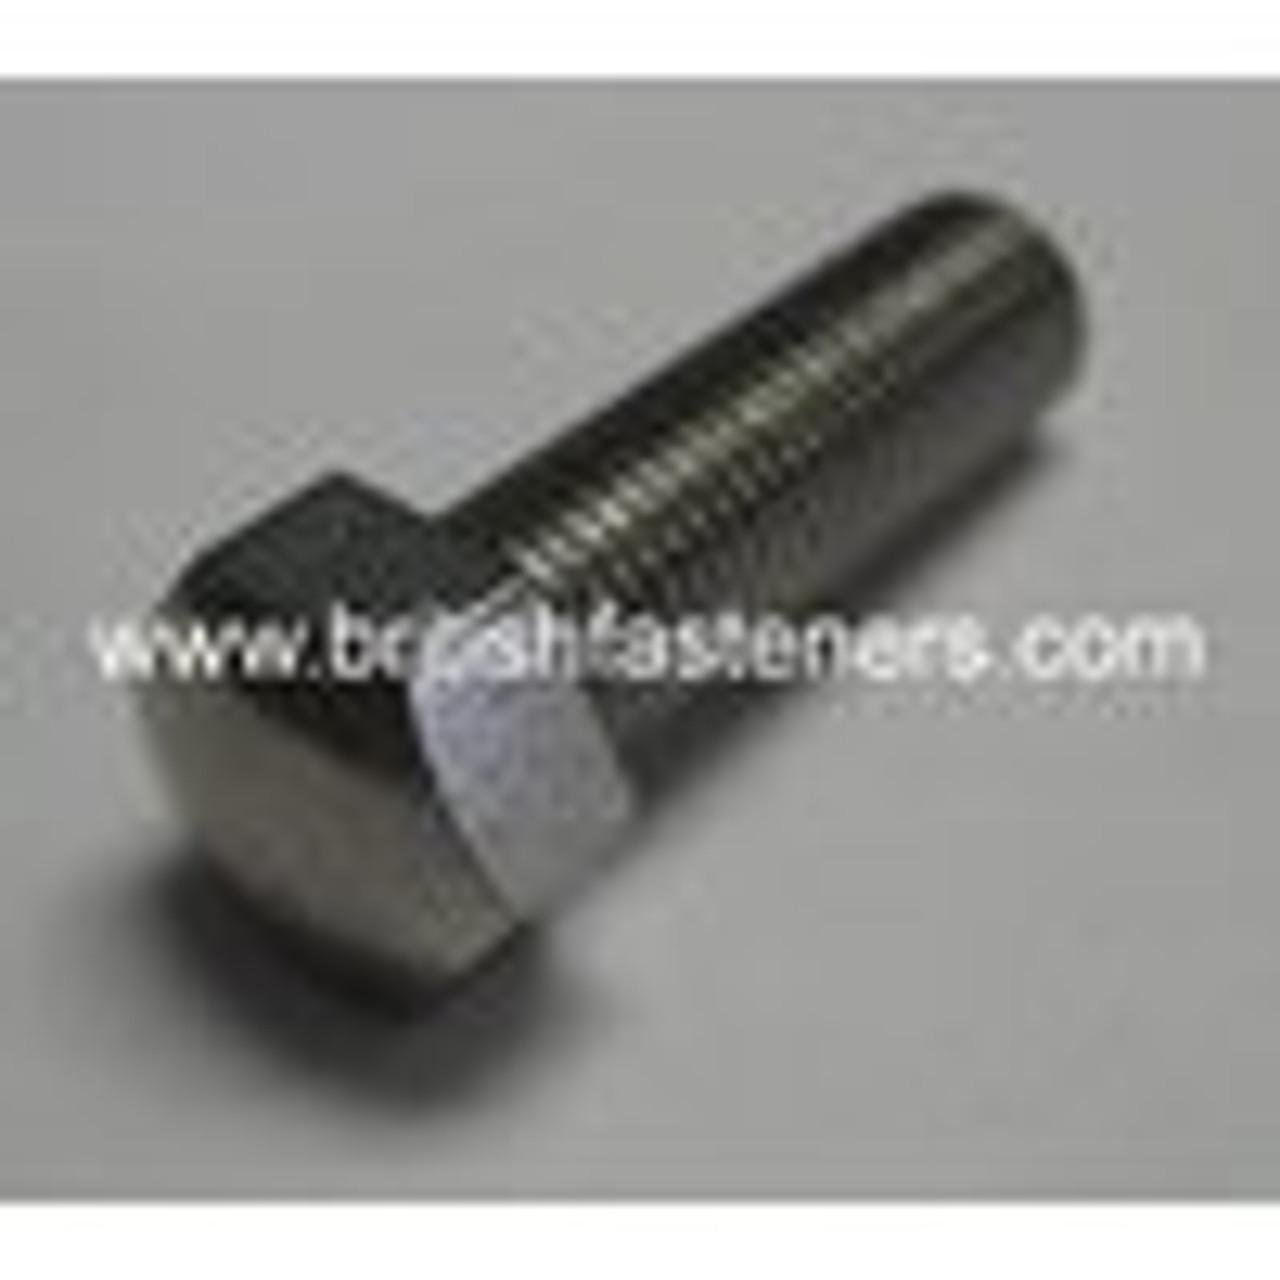 1//4 BSF x 5//8 Slotted Round Steel Screw BS450 SLT RND ST SCREW